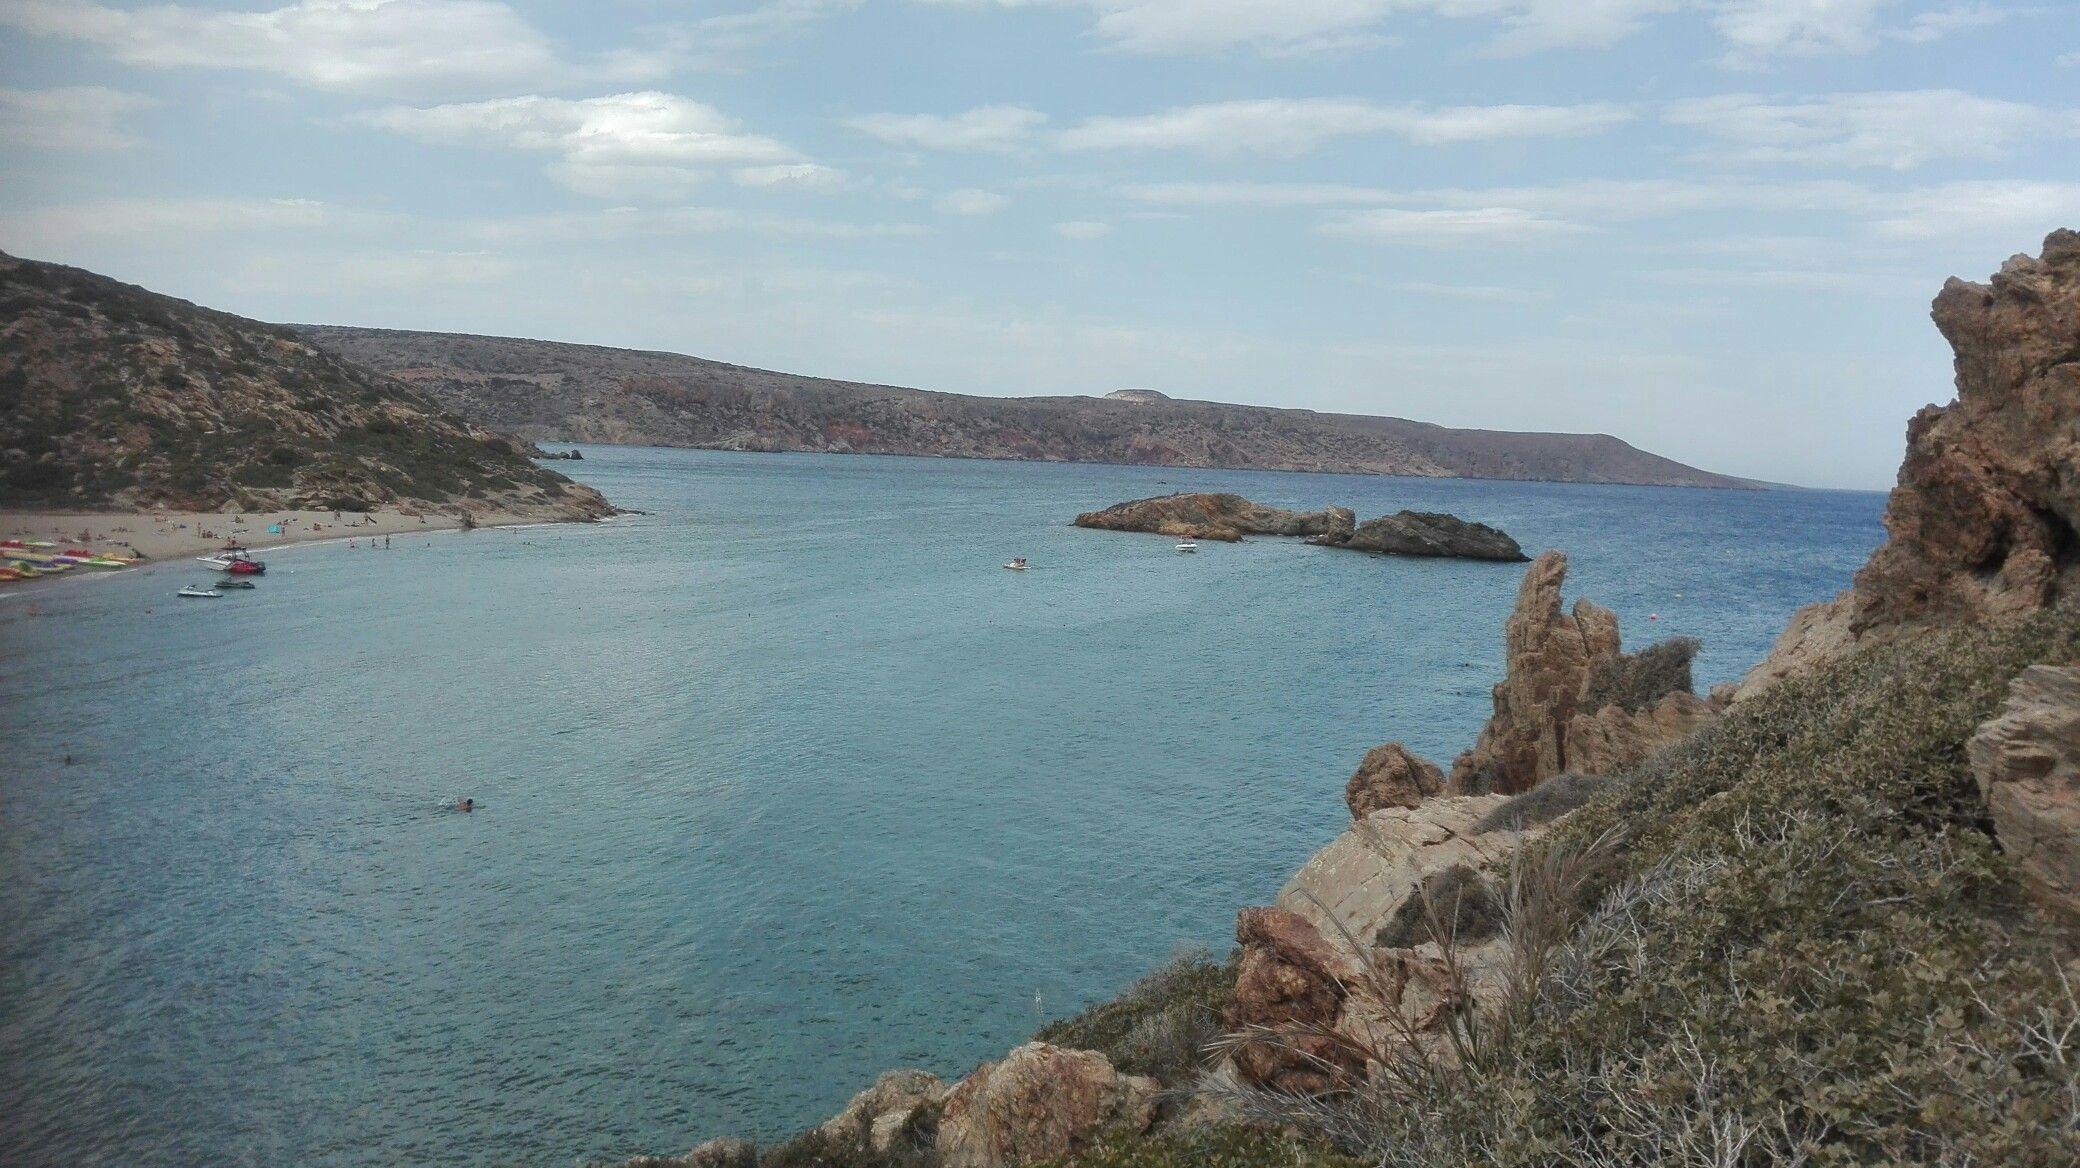 #Vai #Crete #Myjobisbetterthanyours #Palmtrees #Littlepieceofparadise